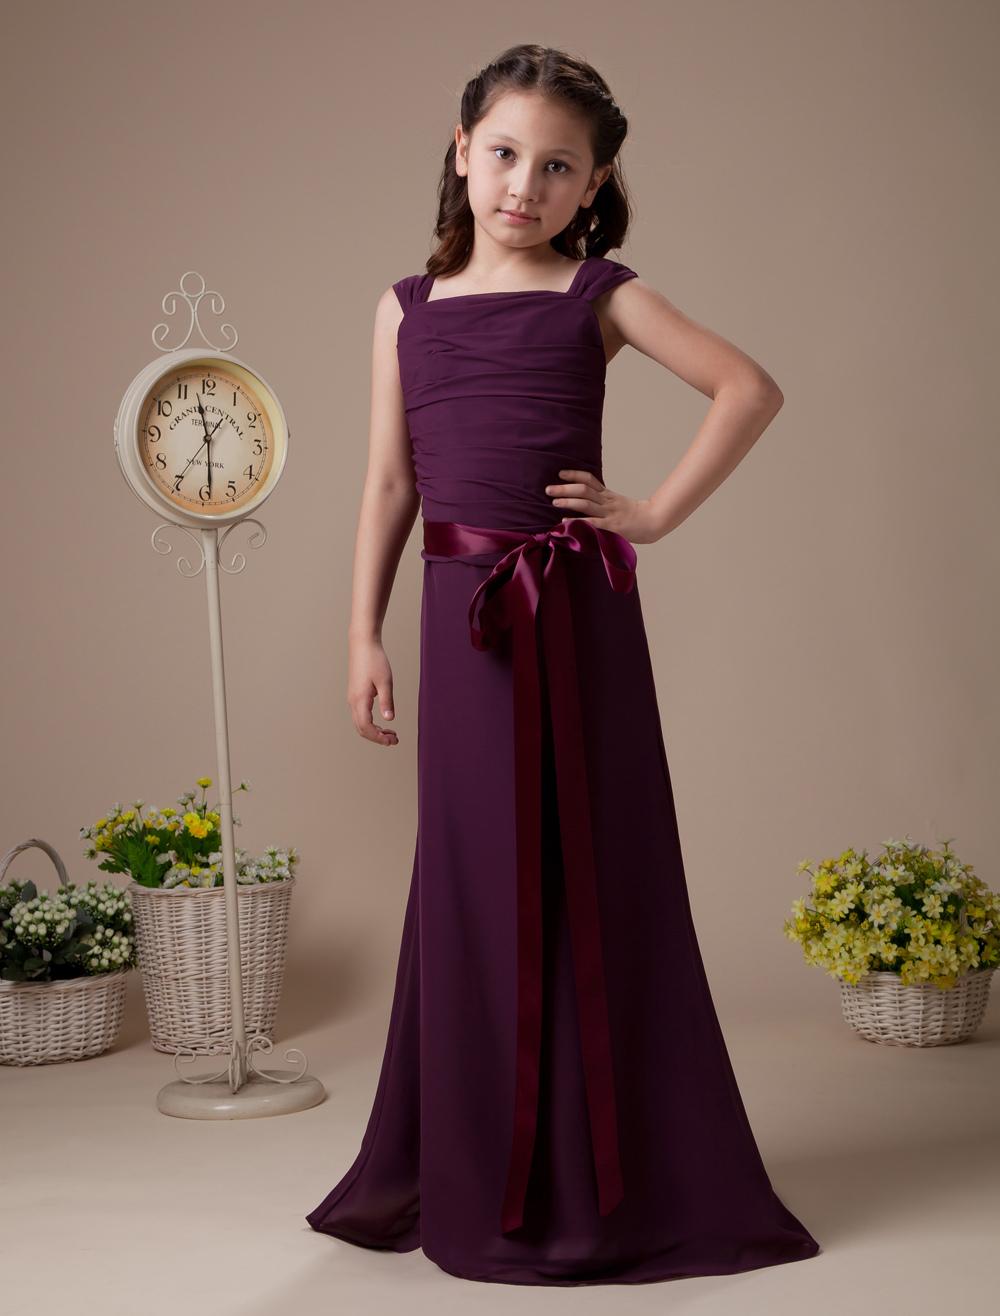 62d462fc700 Purple Pleated Sash Satin Chiffon Flower Girl Dress (Wedding) photo